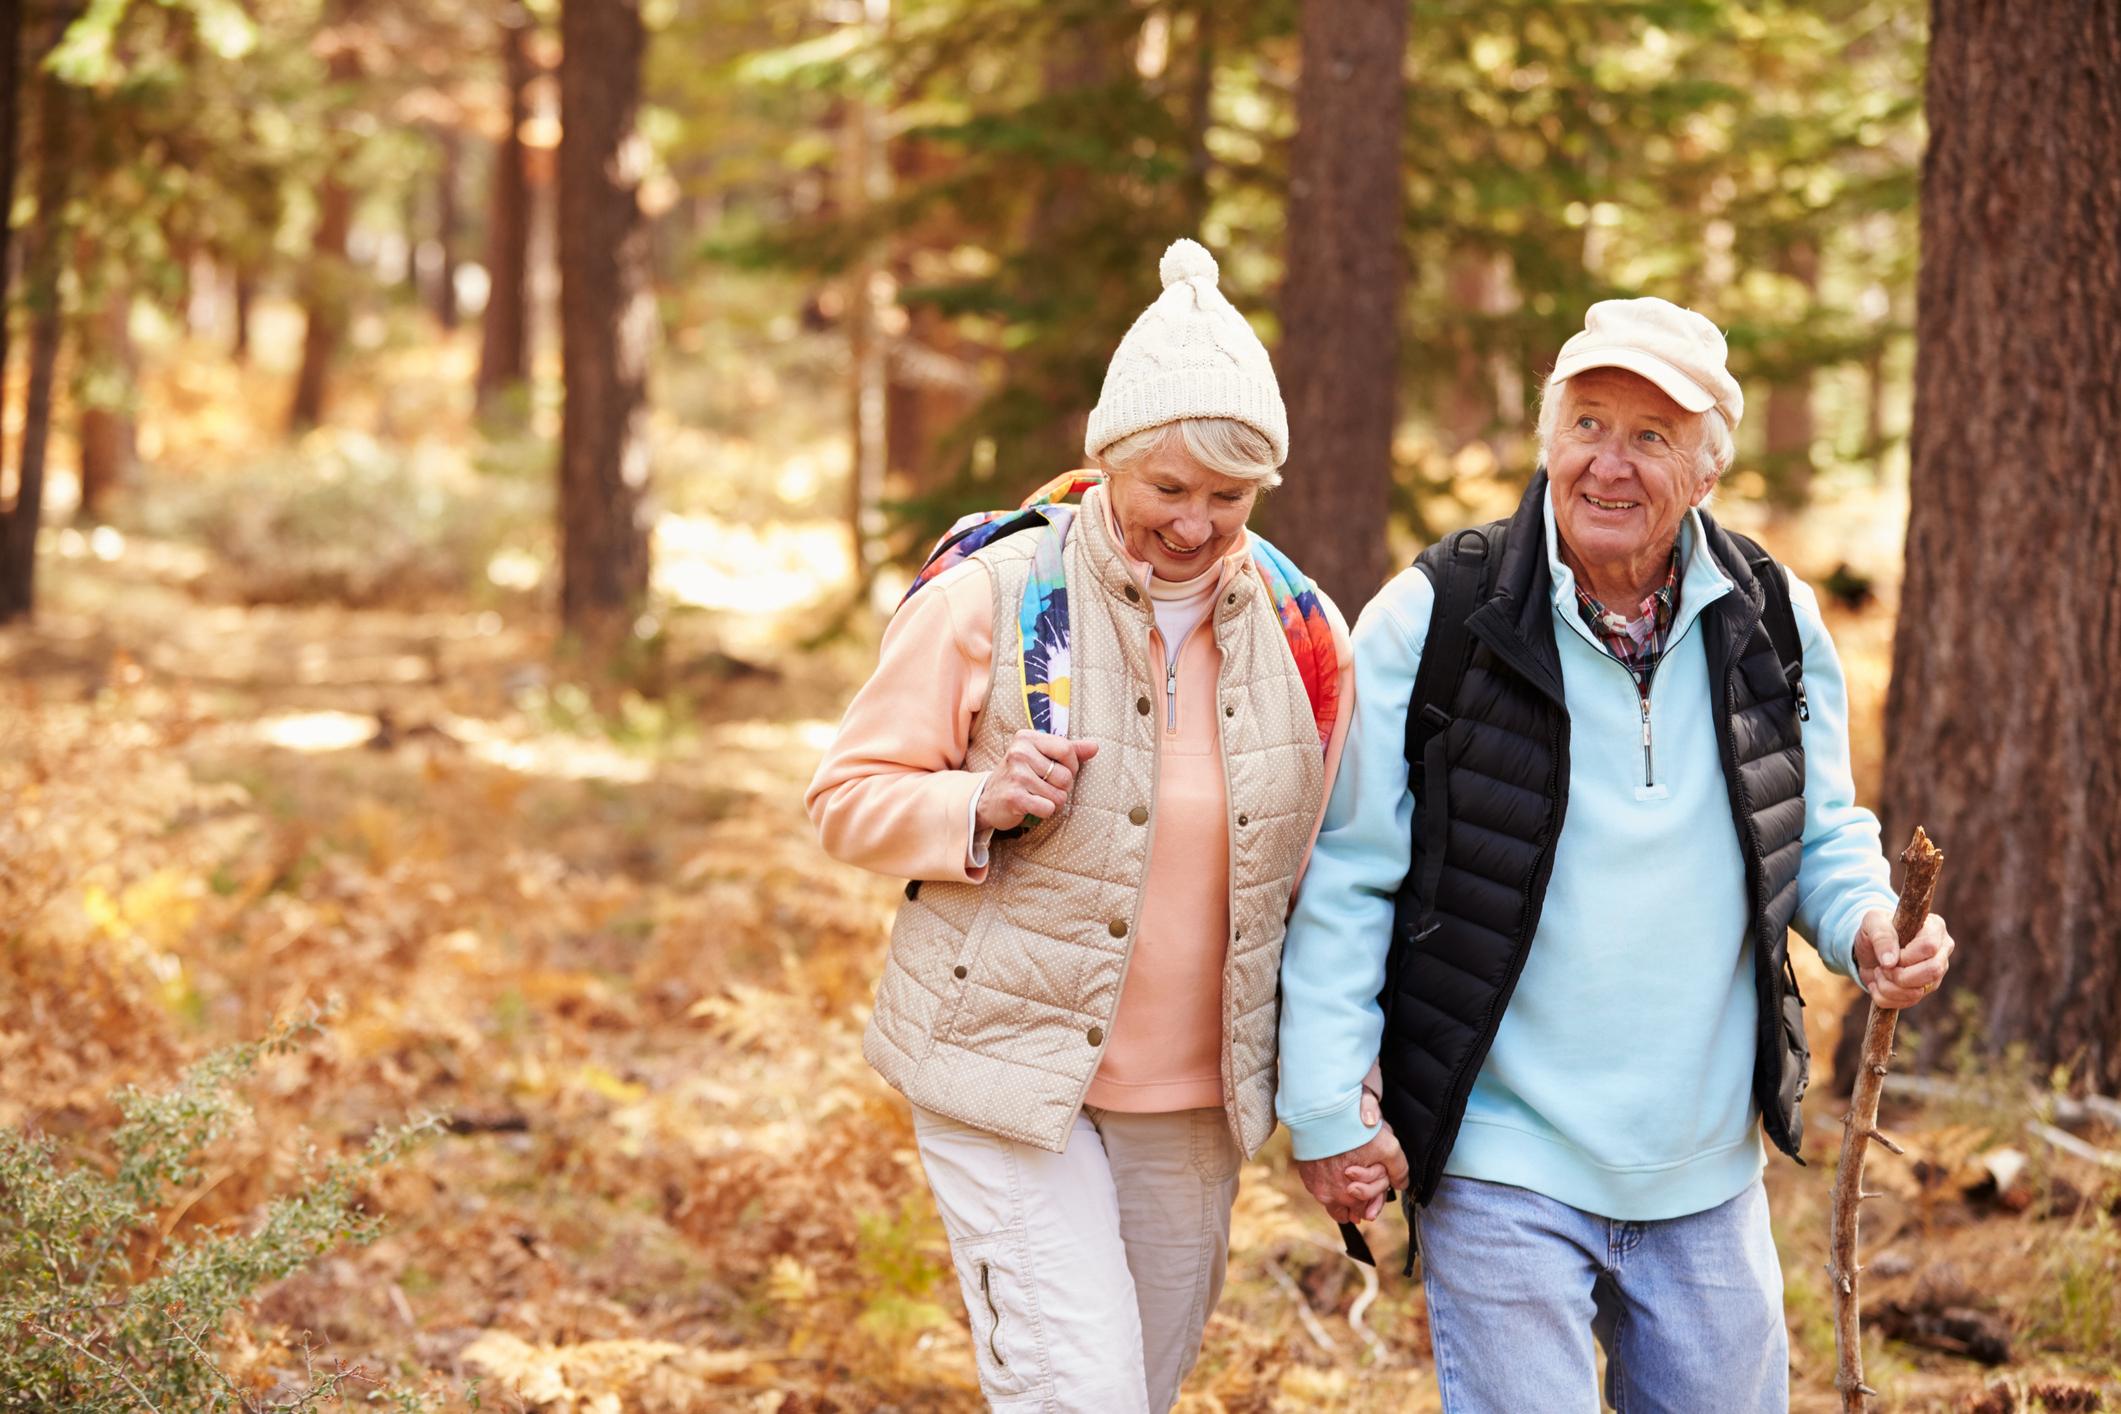 Senior couple walking through a wooded area